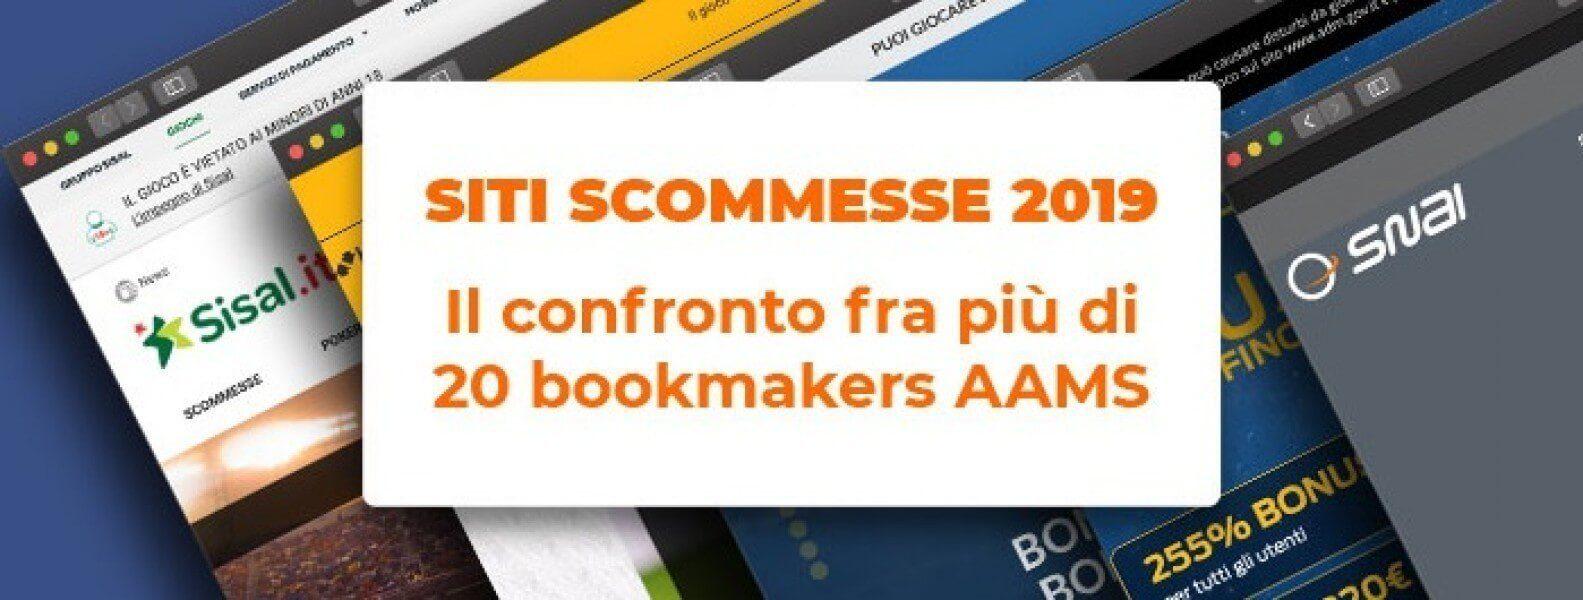 sit _scommesse 2019/2020